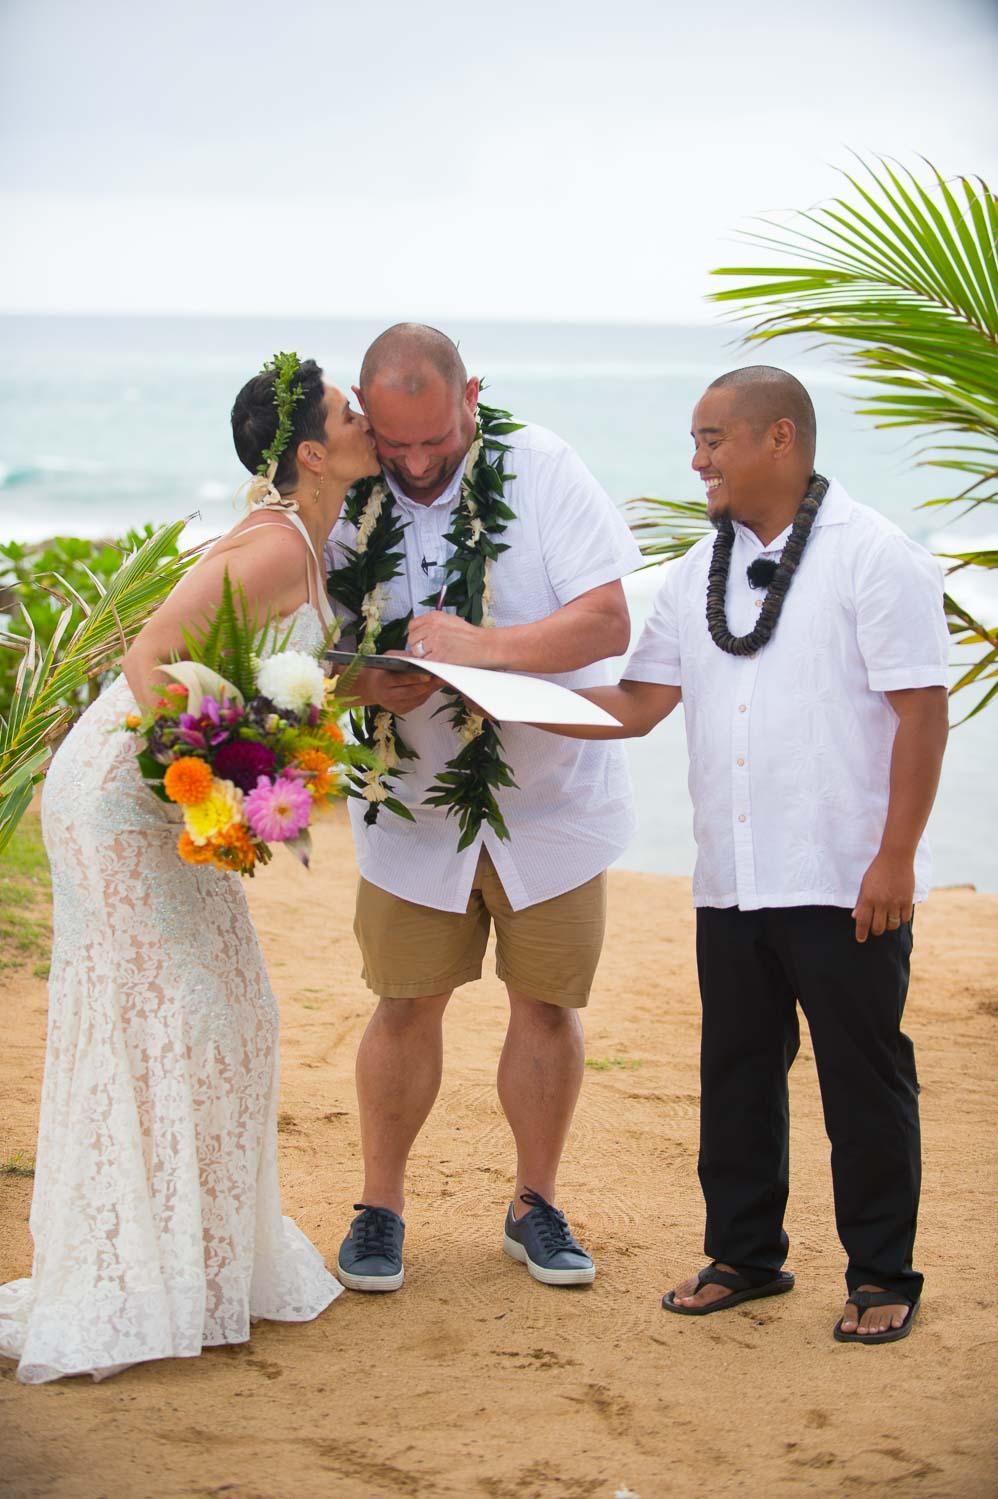 maui-wedding-photography-maui-wedding-venue-Tad-Craig-Photography-23.jpg